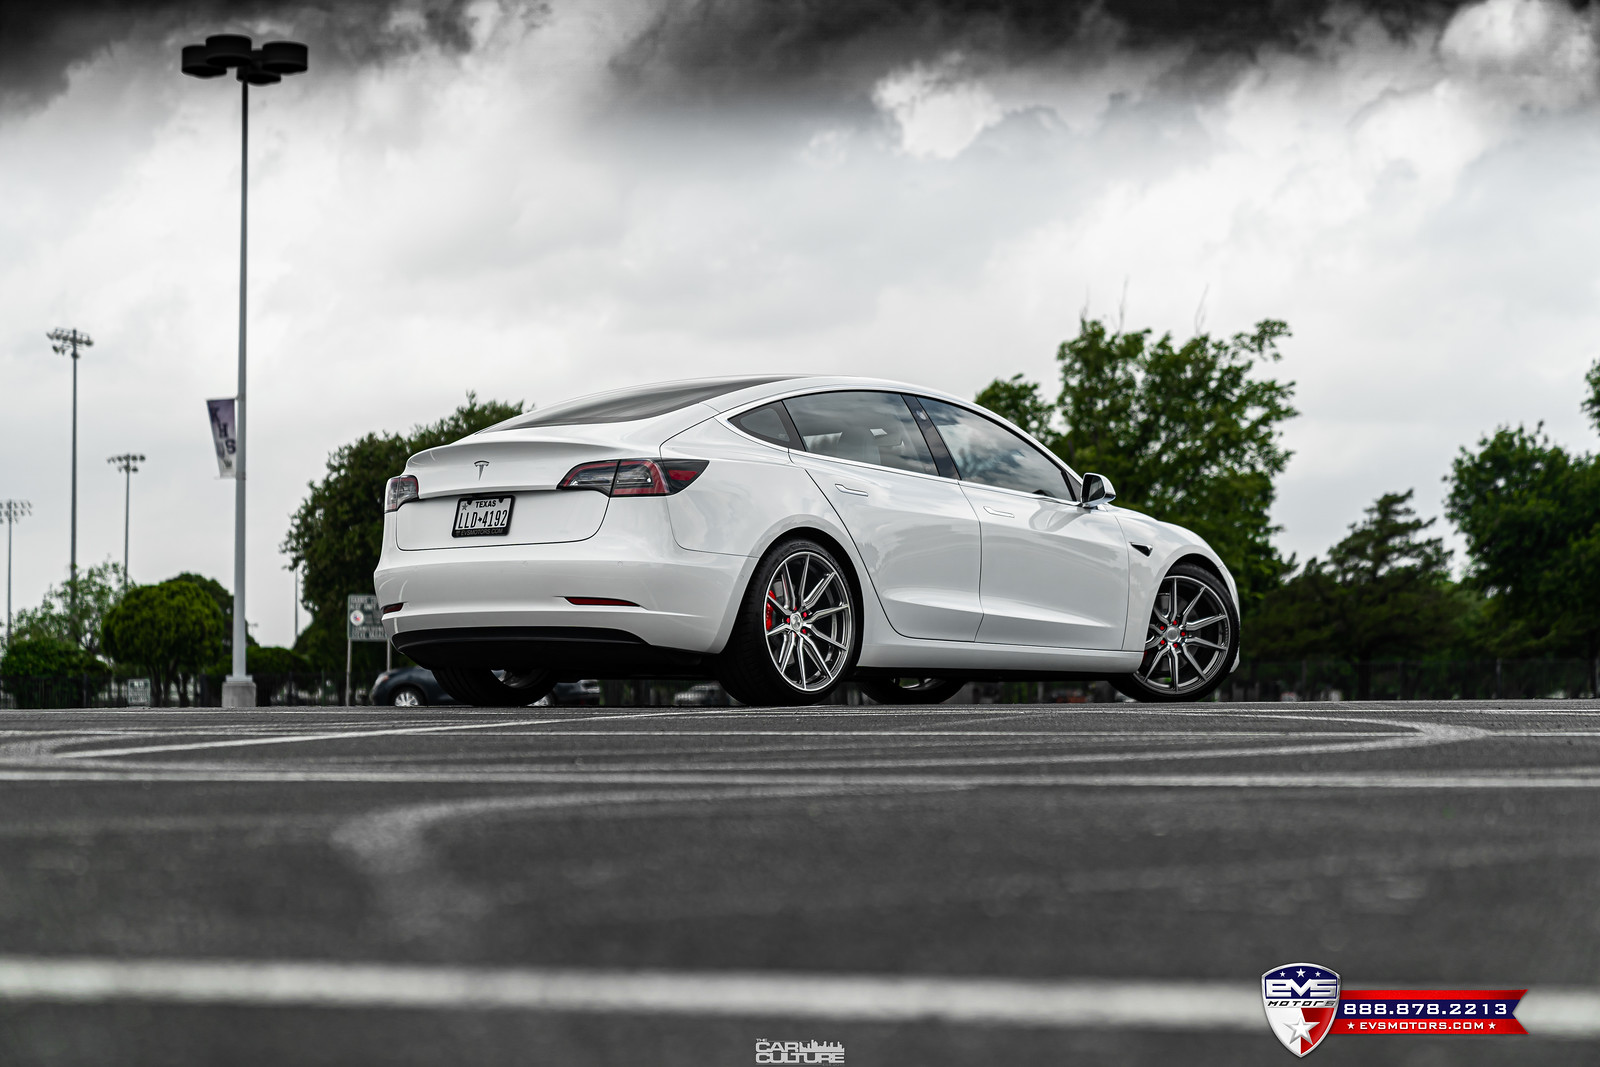 2018 Tesla Model 3 Performance Vossen HF3 Wheels-132-X3.jpg